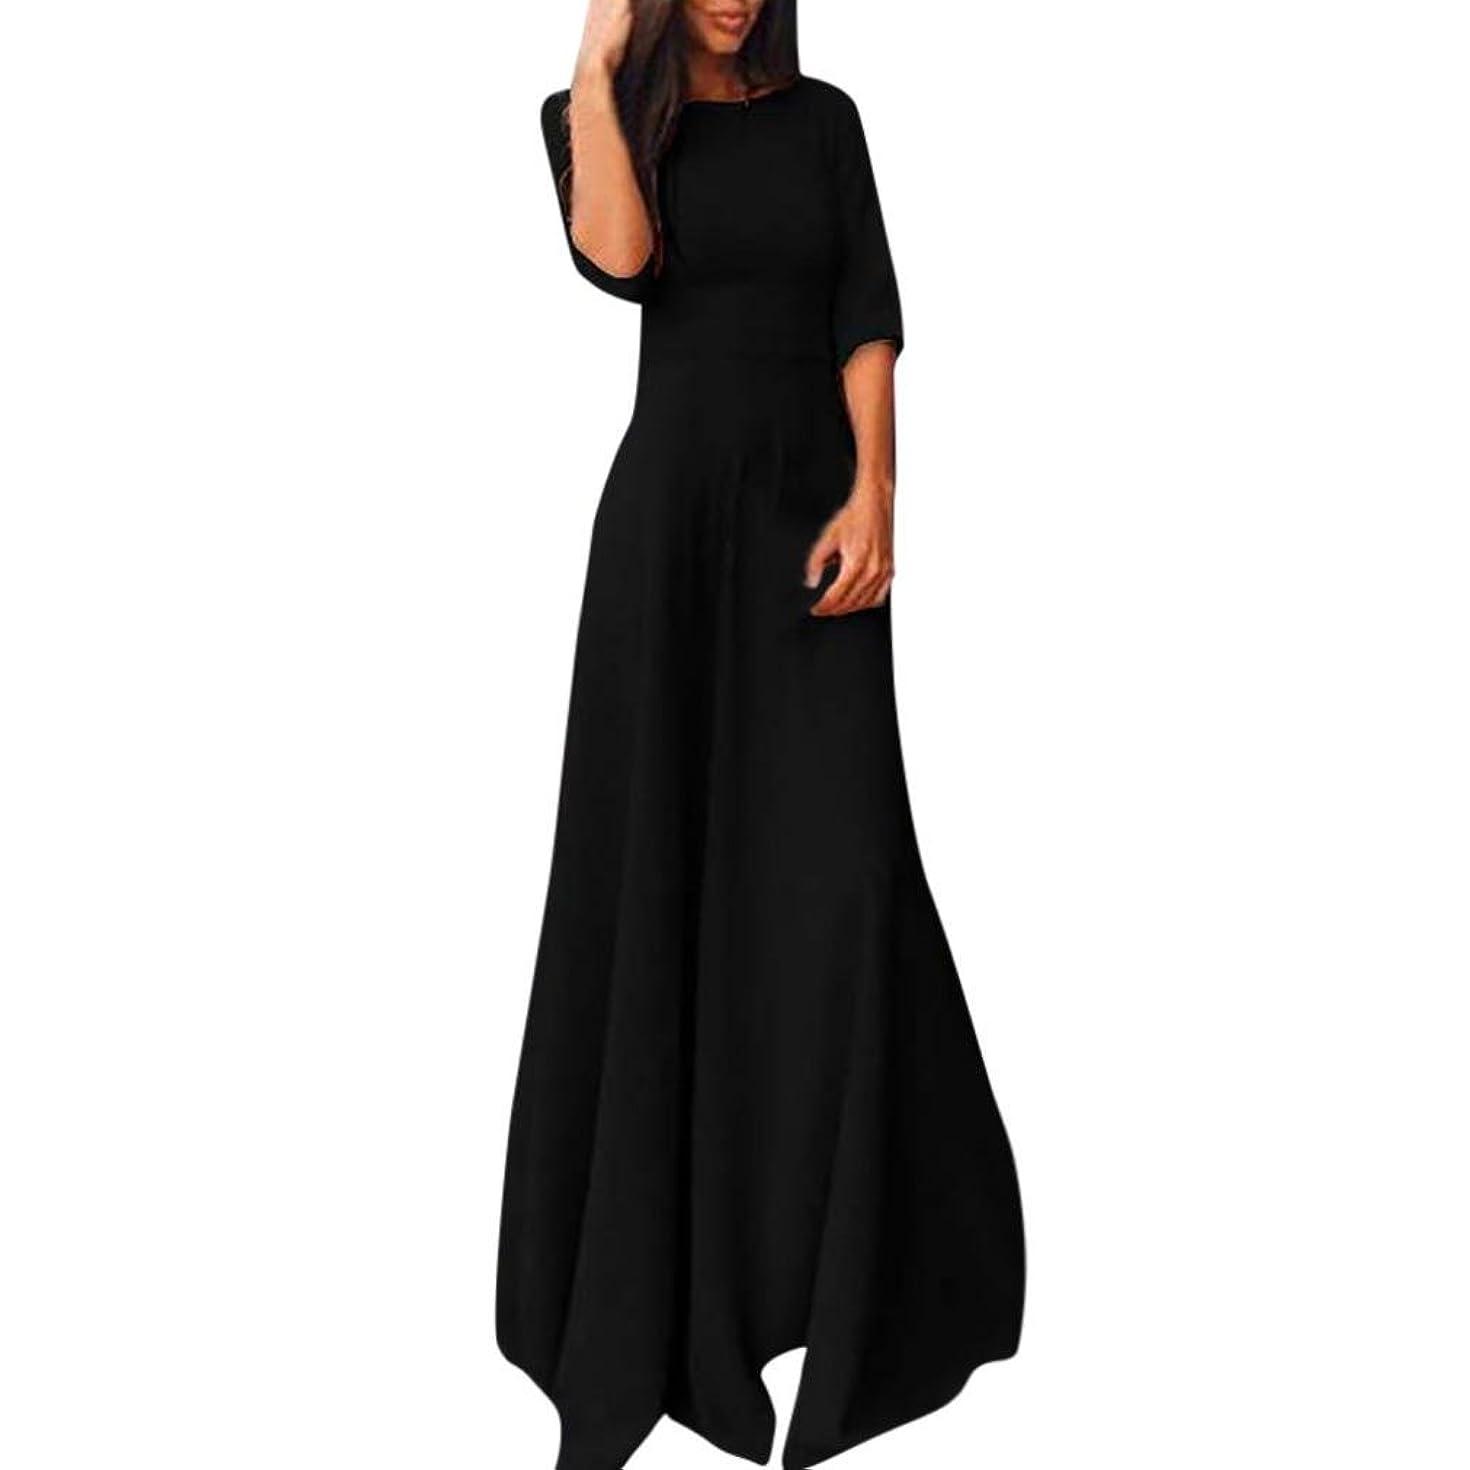 Goddessvan Womens Chiffon 3/4 Sleeve Evening Formal Party Prom Ball Gown Long Maxi Dress